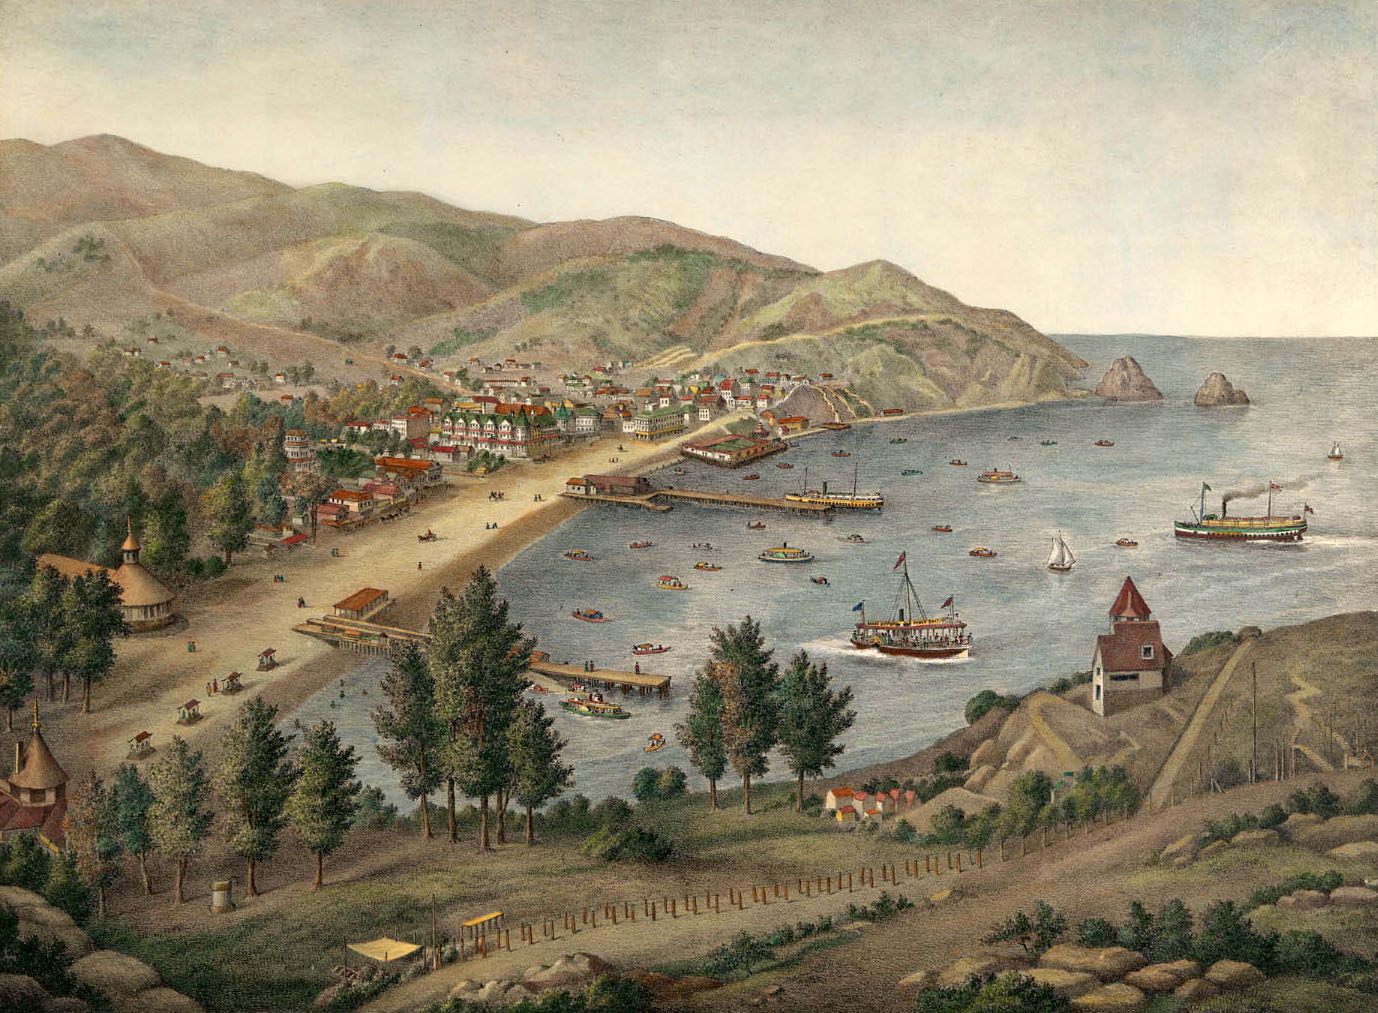 View of Avalon Bay, Santa Catalina Island, circa 1905